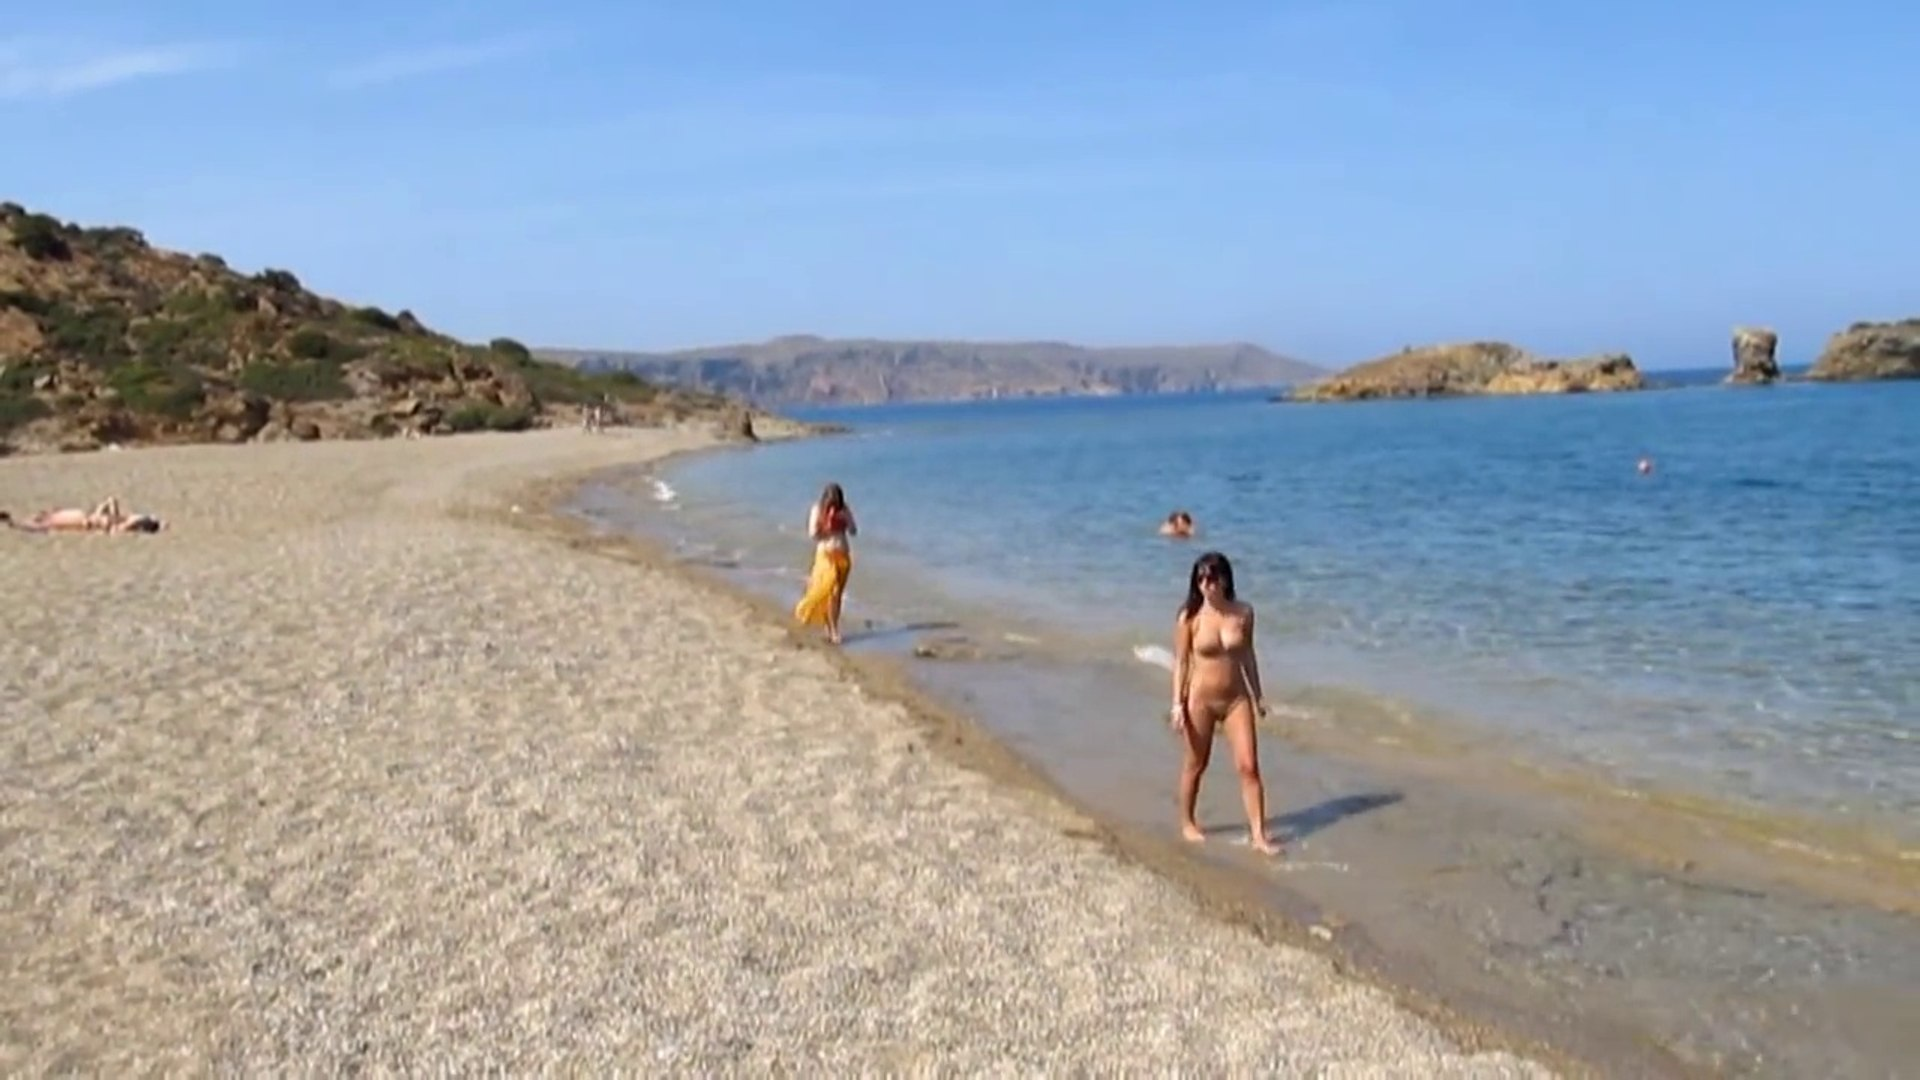 Vai palm beach Crete Greece Пальмовый пляж Вай Греция Крит